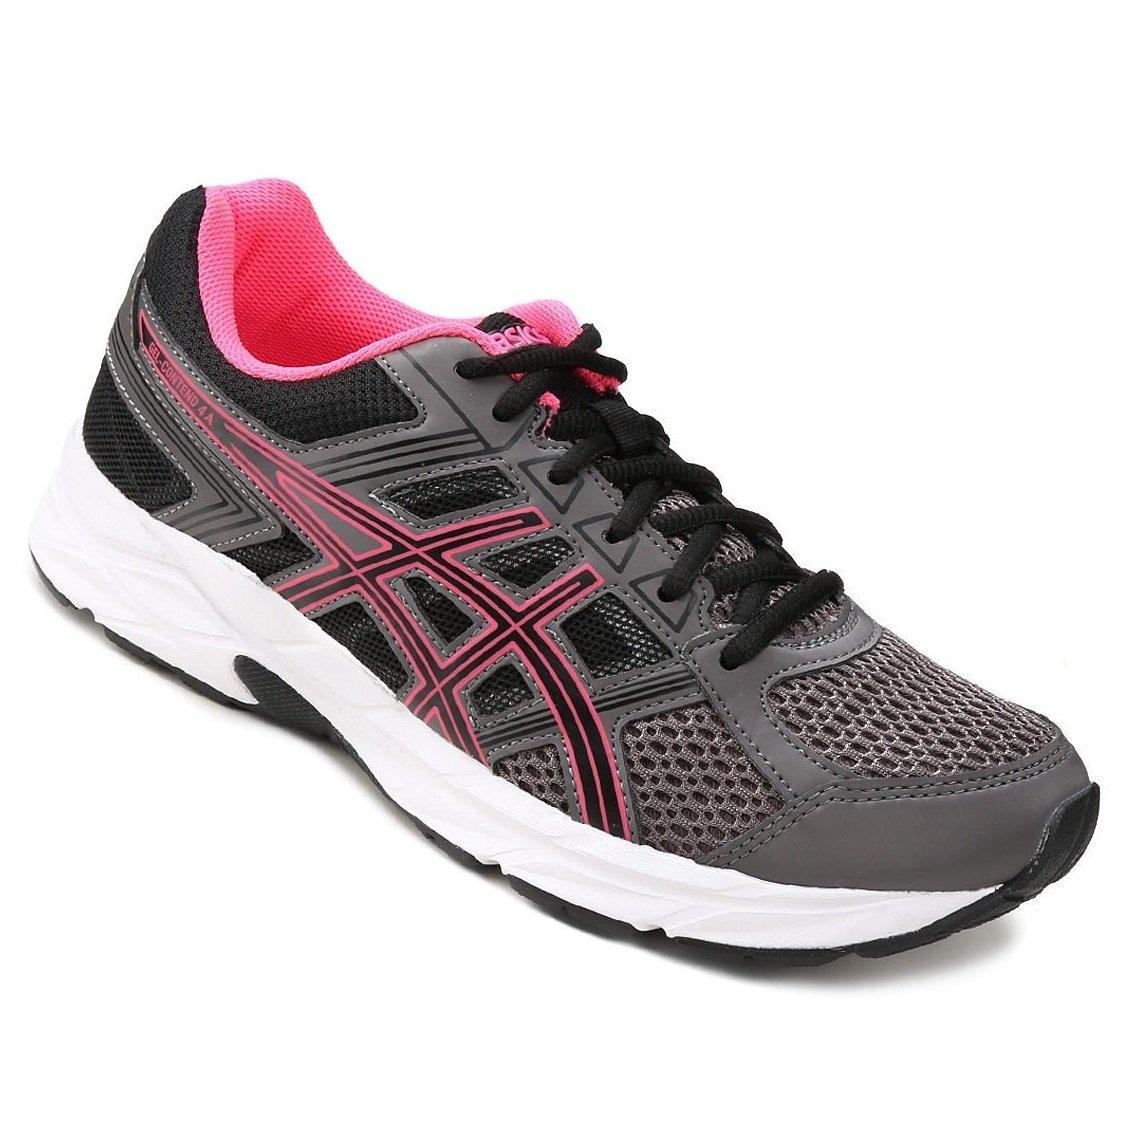 Tênis Feminino Asics Gel-Contend 4 A T076A-9490 Chumbo Pink 718bfeea7f692